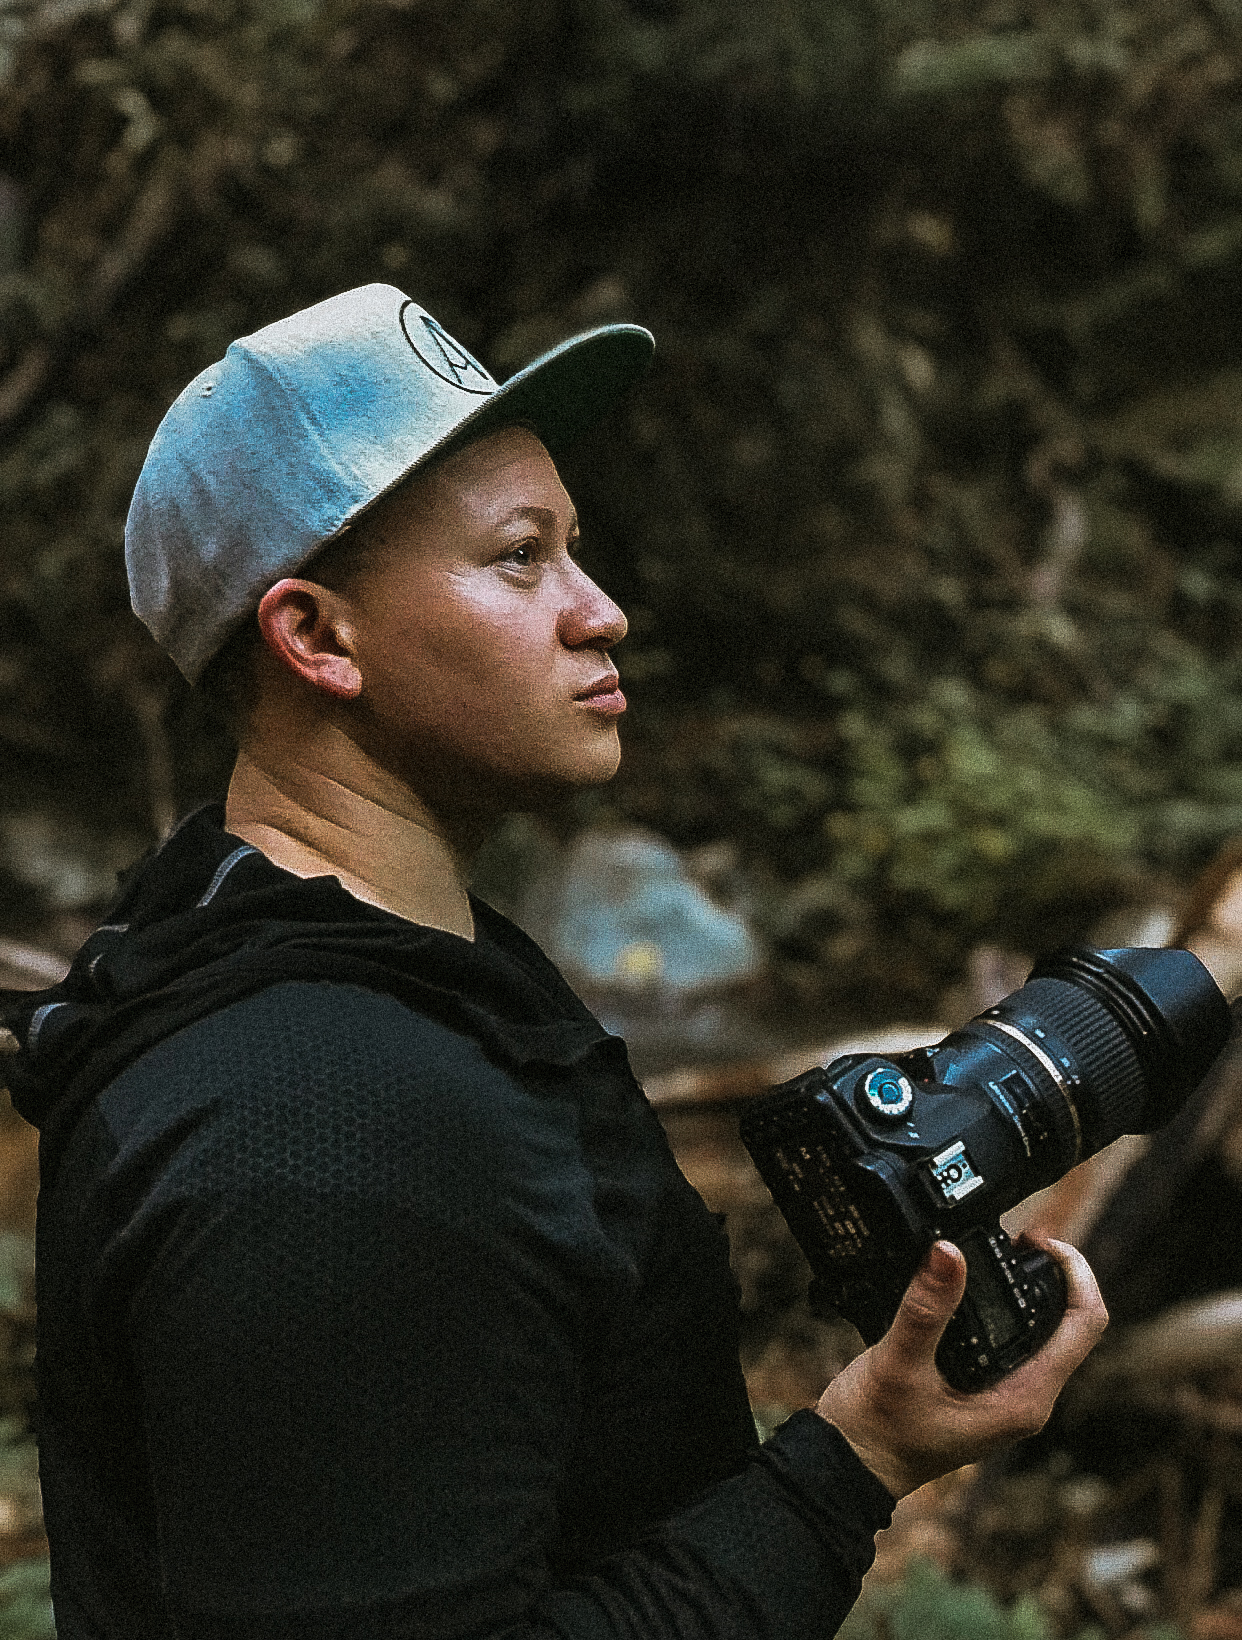 Lathan J - Photography